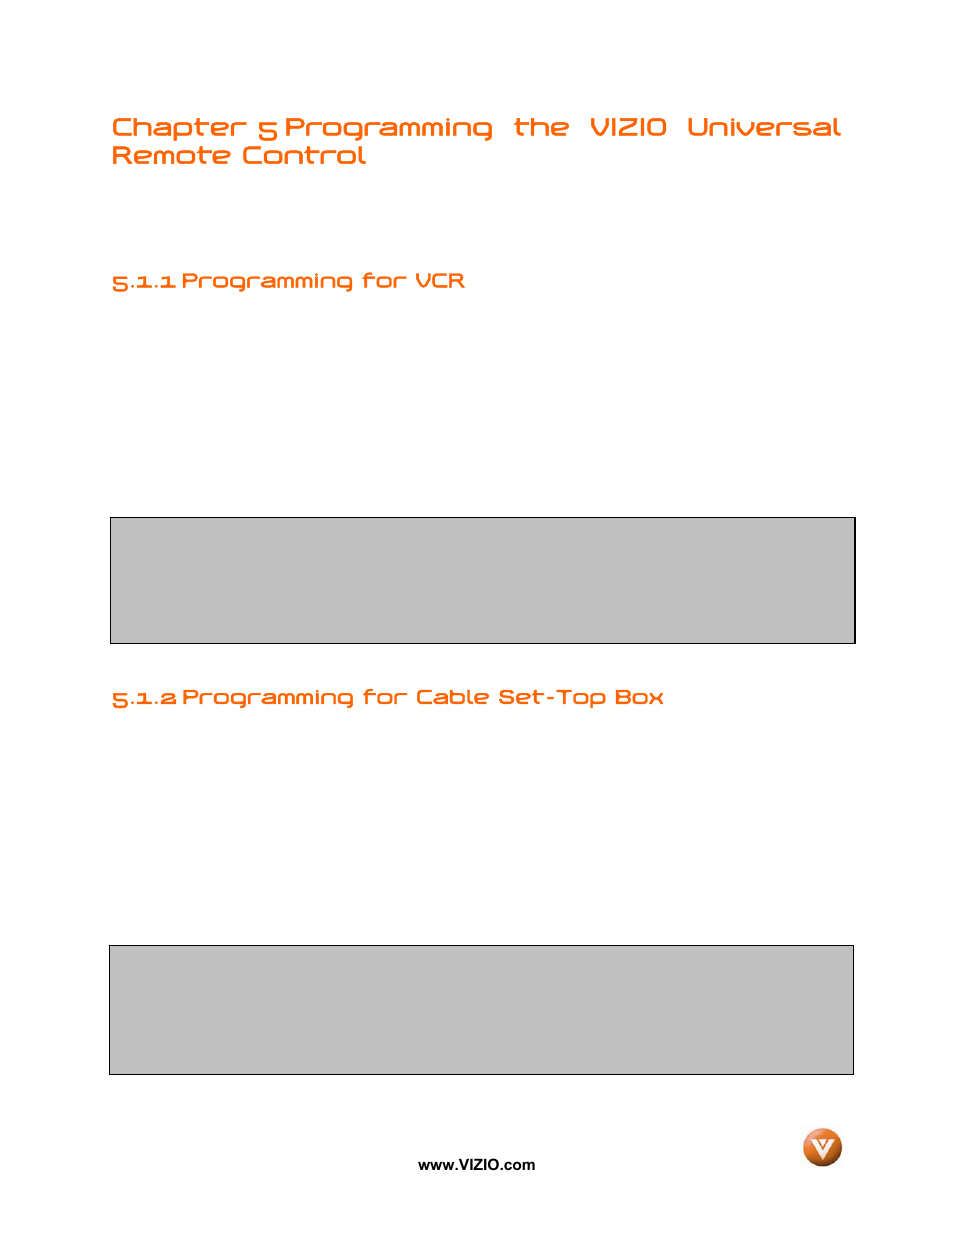 1 programming for vcr, 2 programming for cable set-top box | Vizio